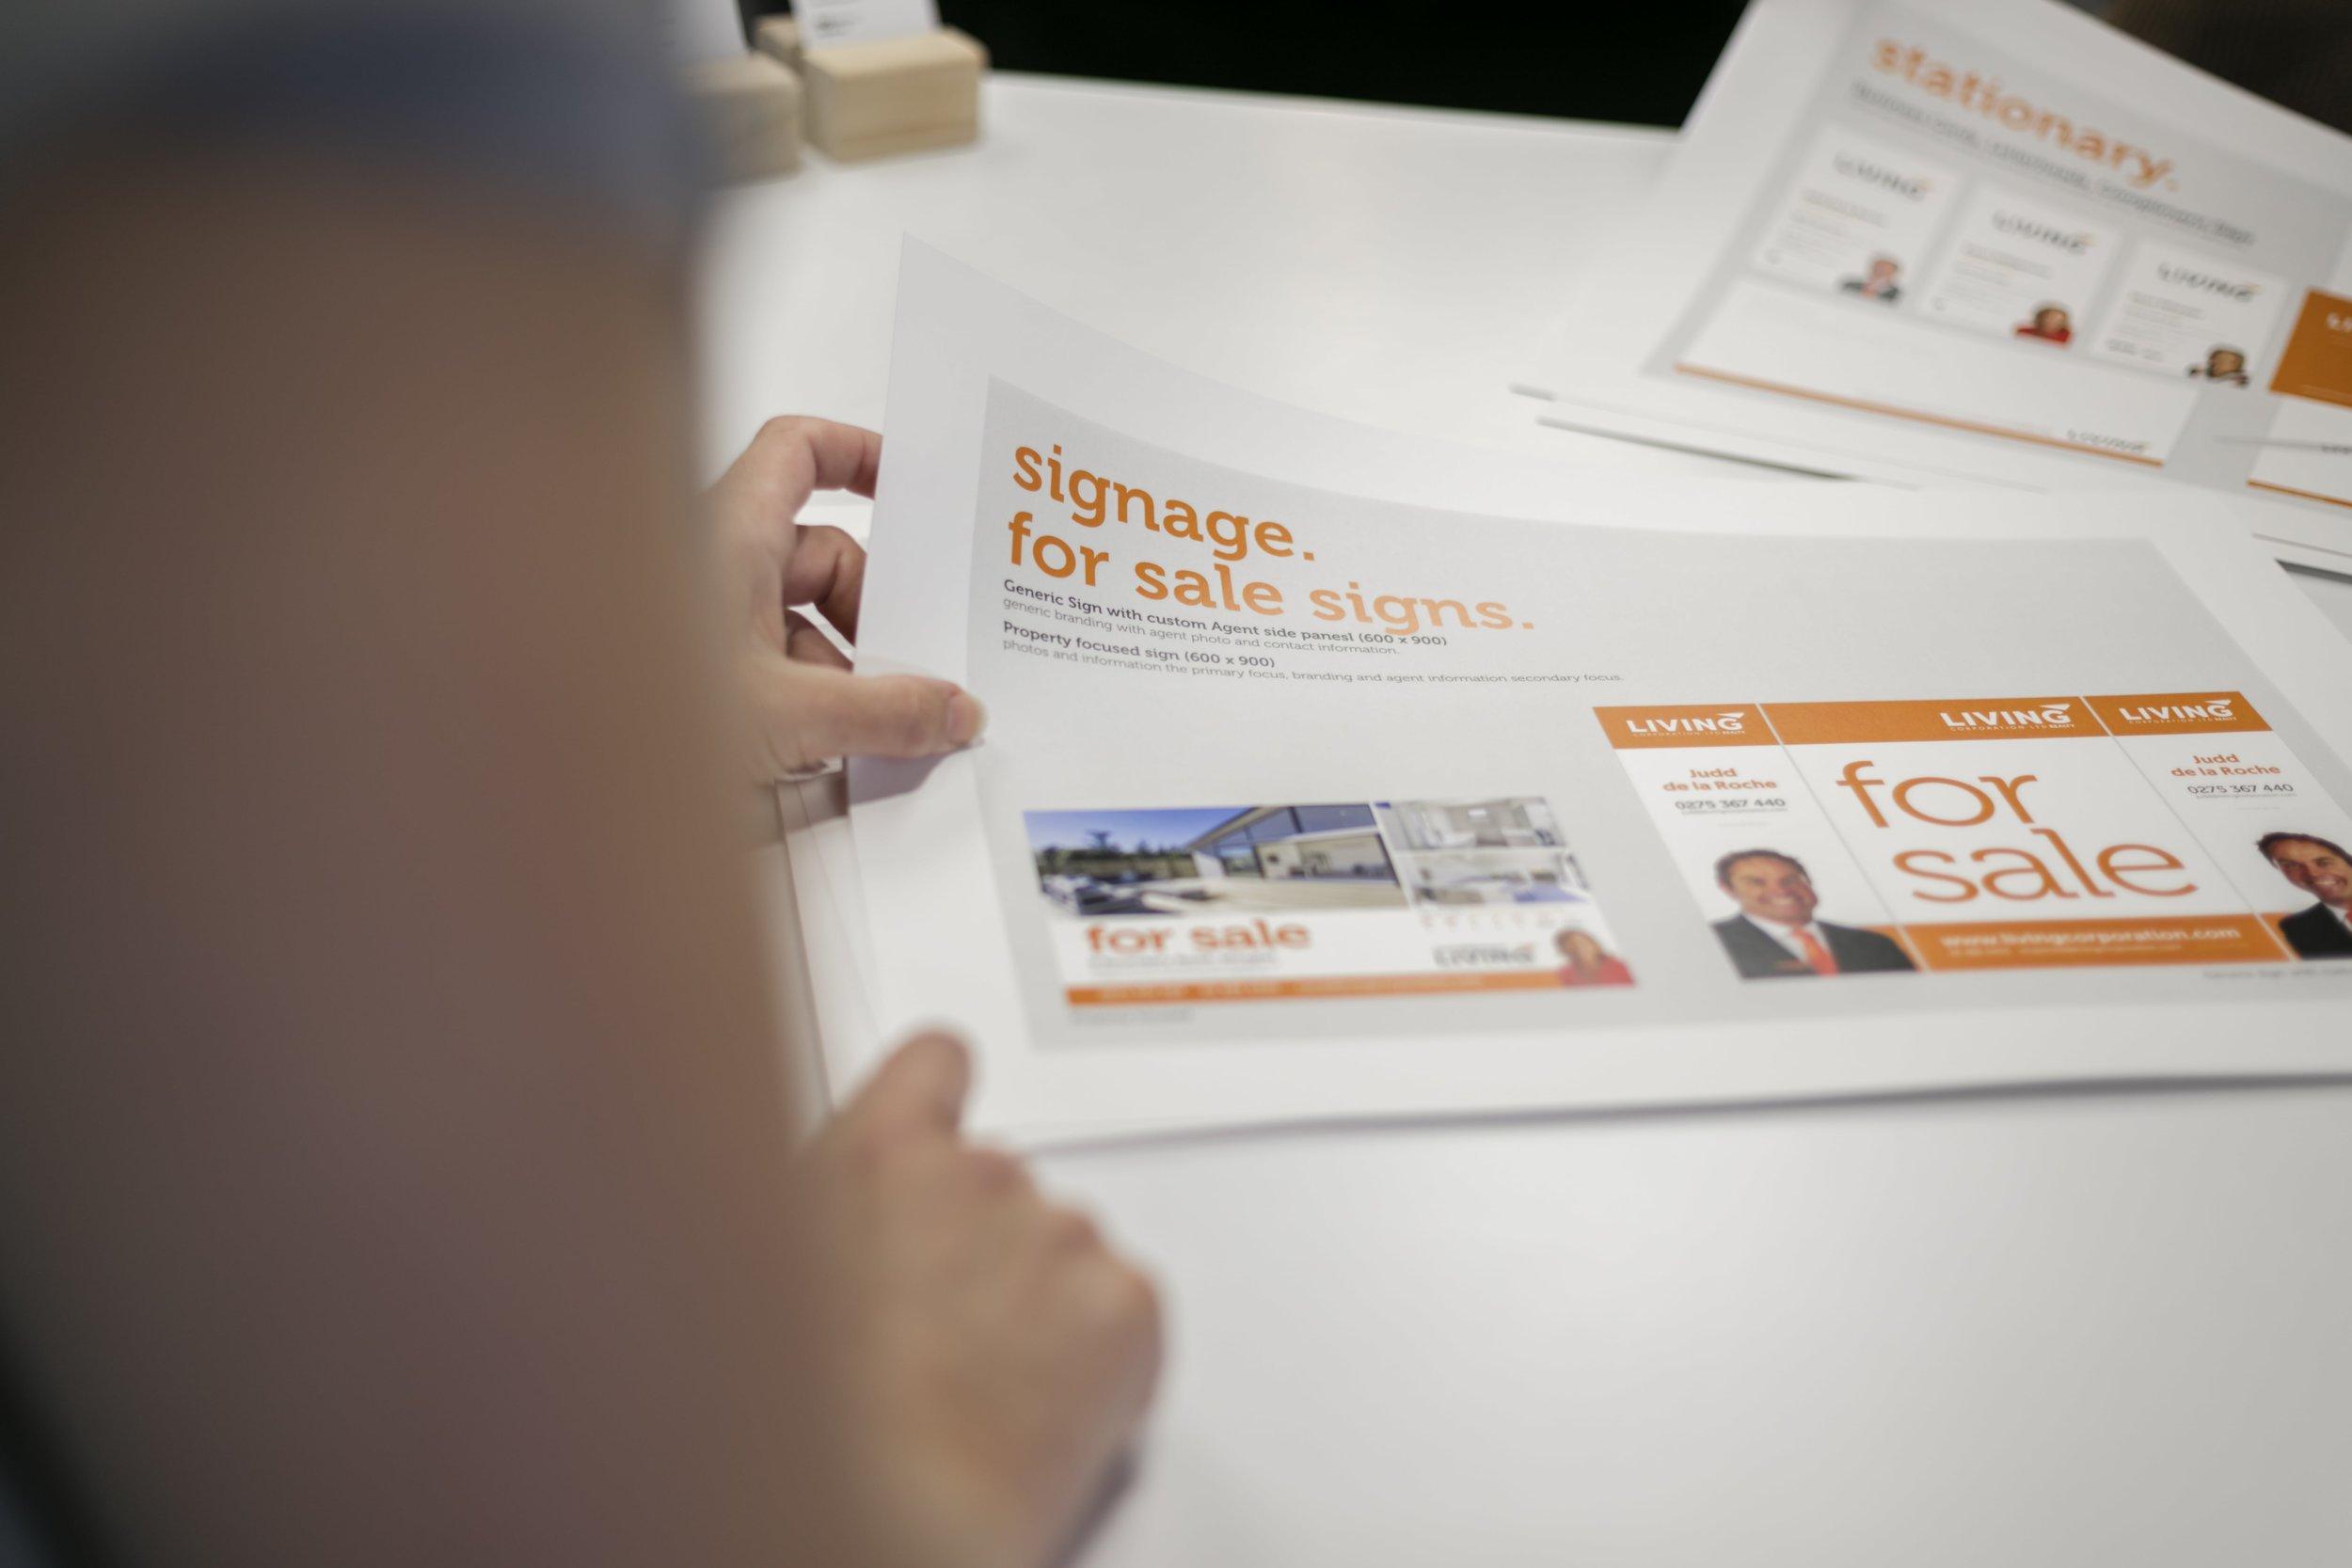 Branding-Consulting-3.jpg